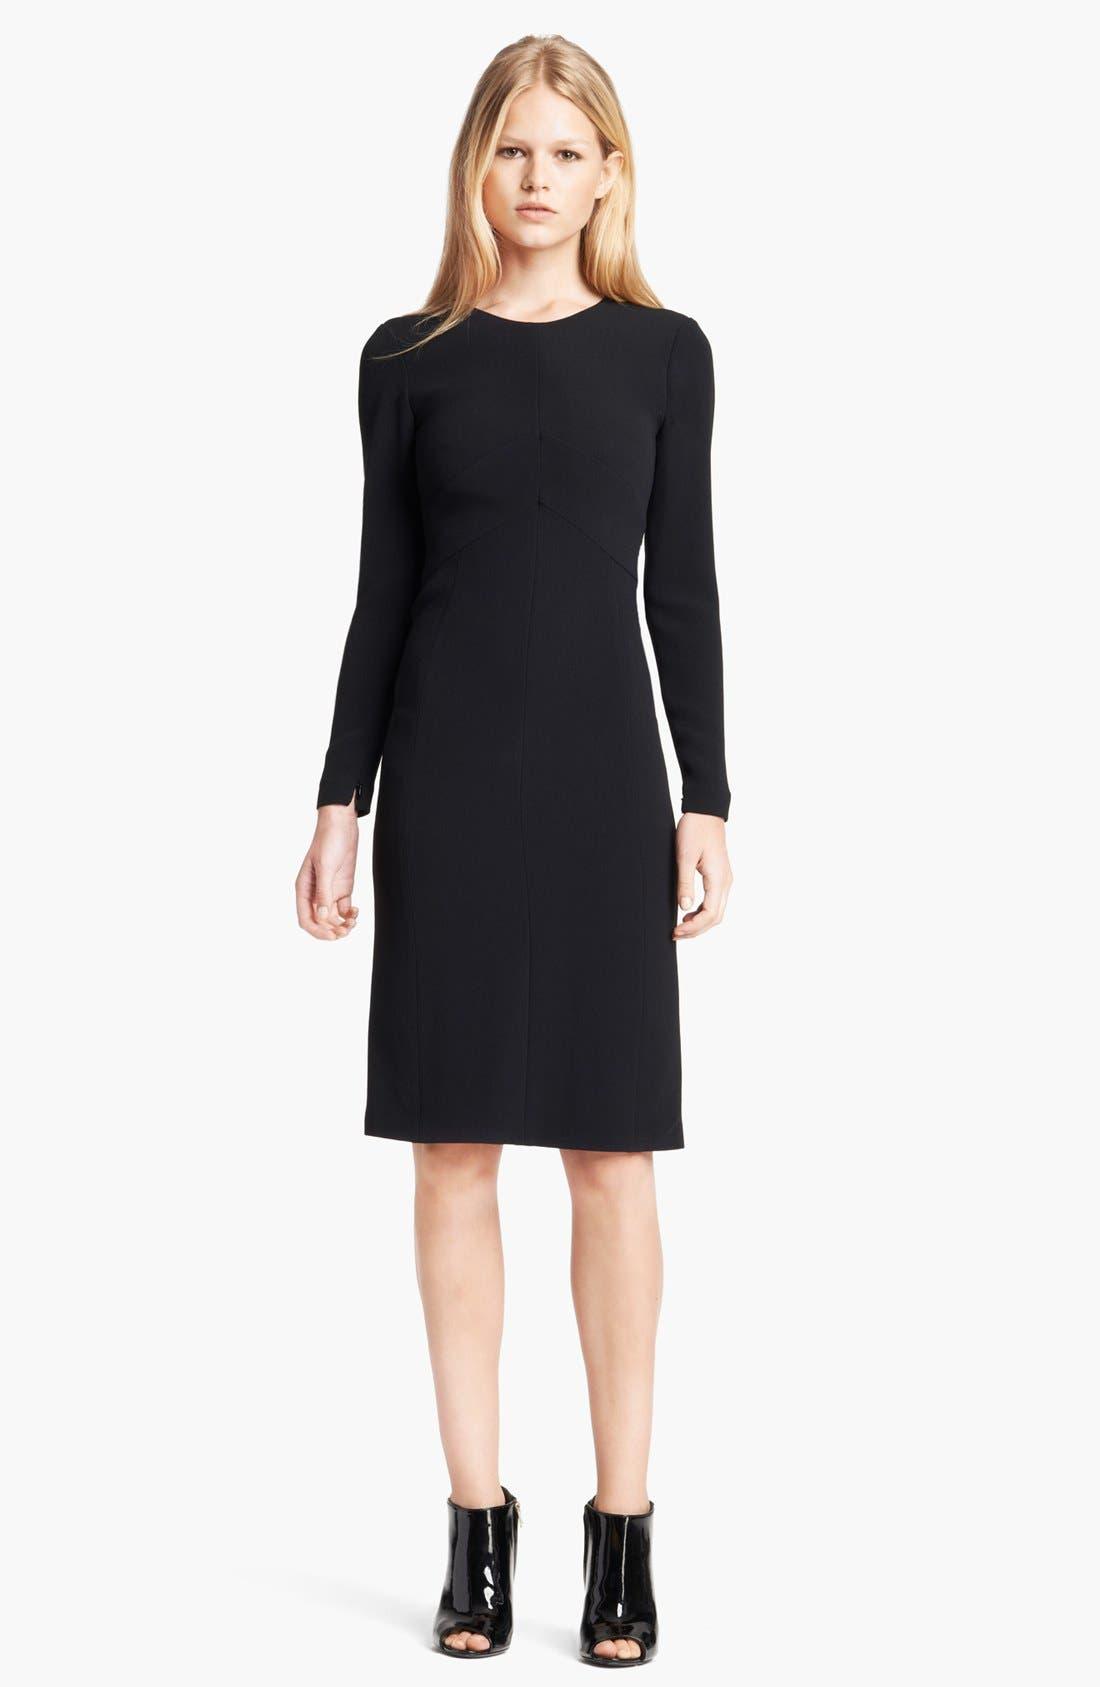 Alternate Image 1 Selected - Burberry Prorsum Chevron Detail Tailored Dress